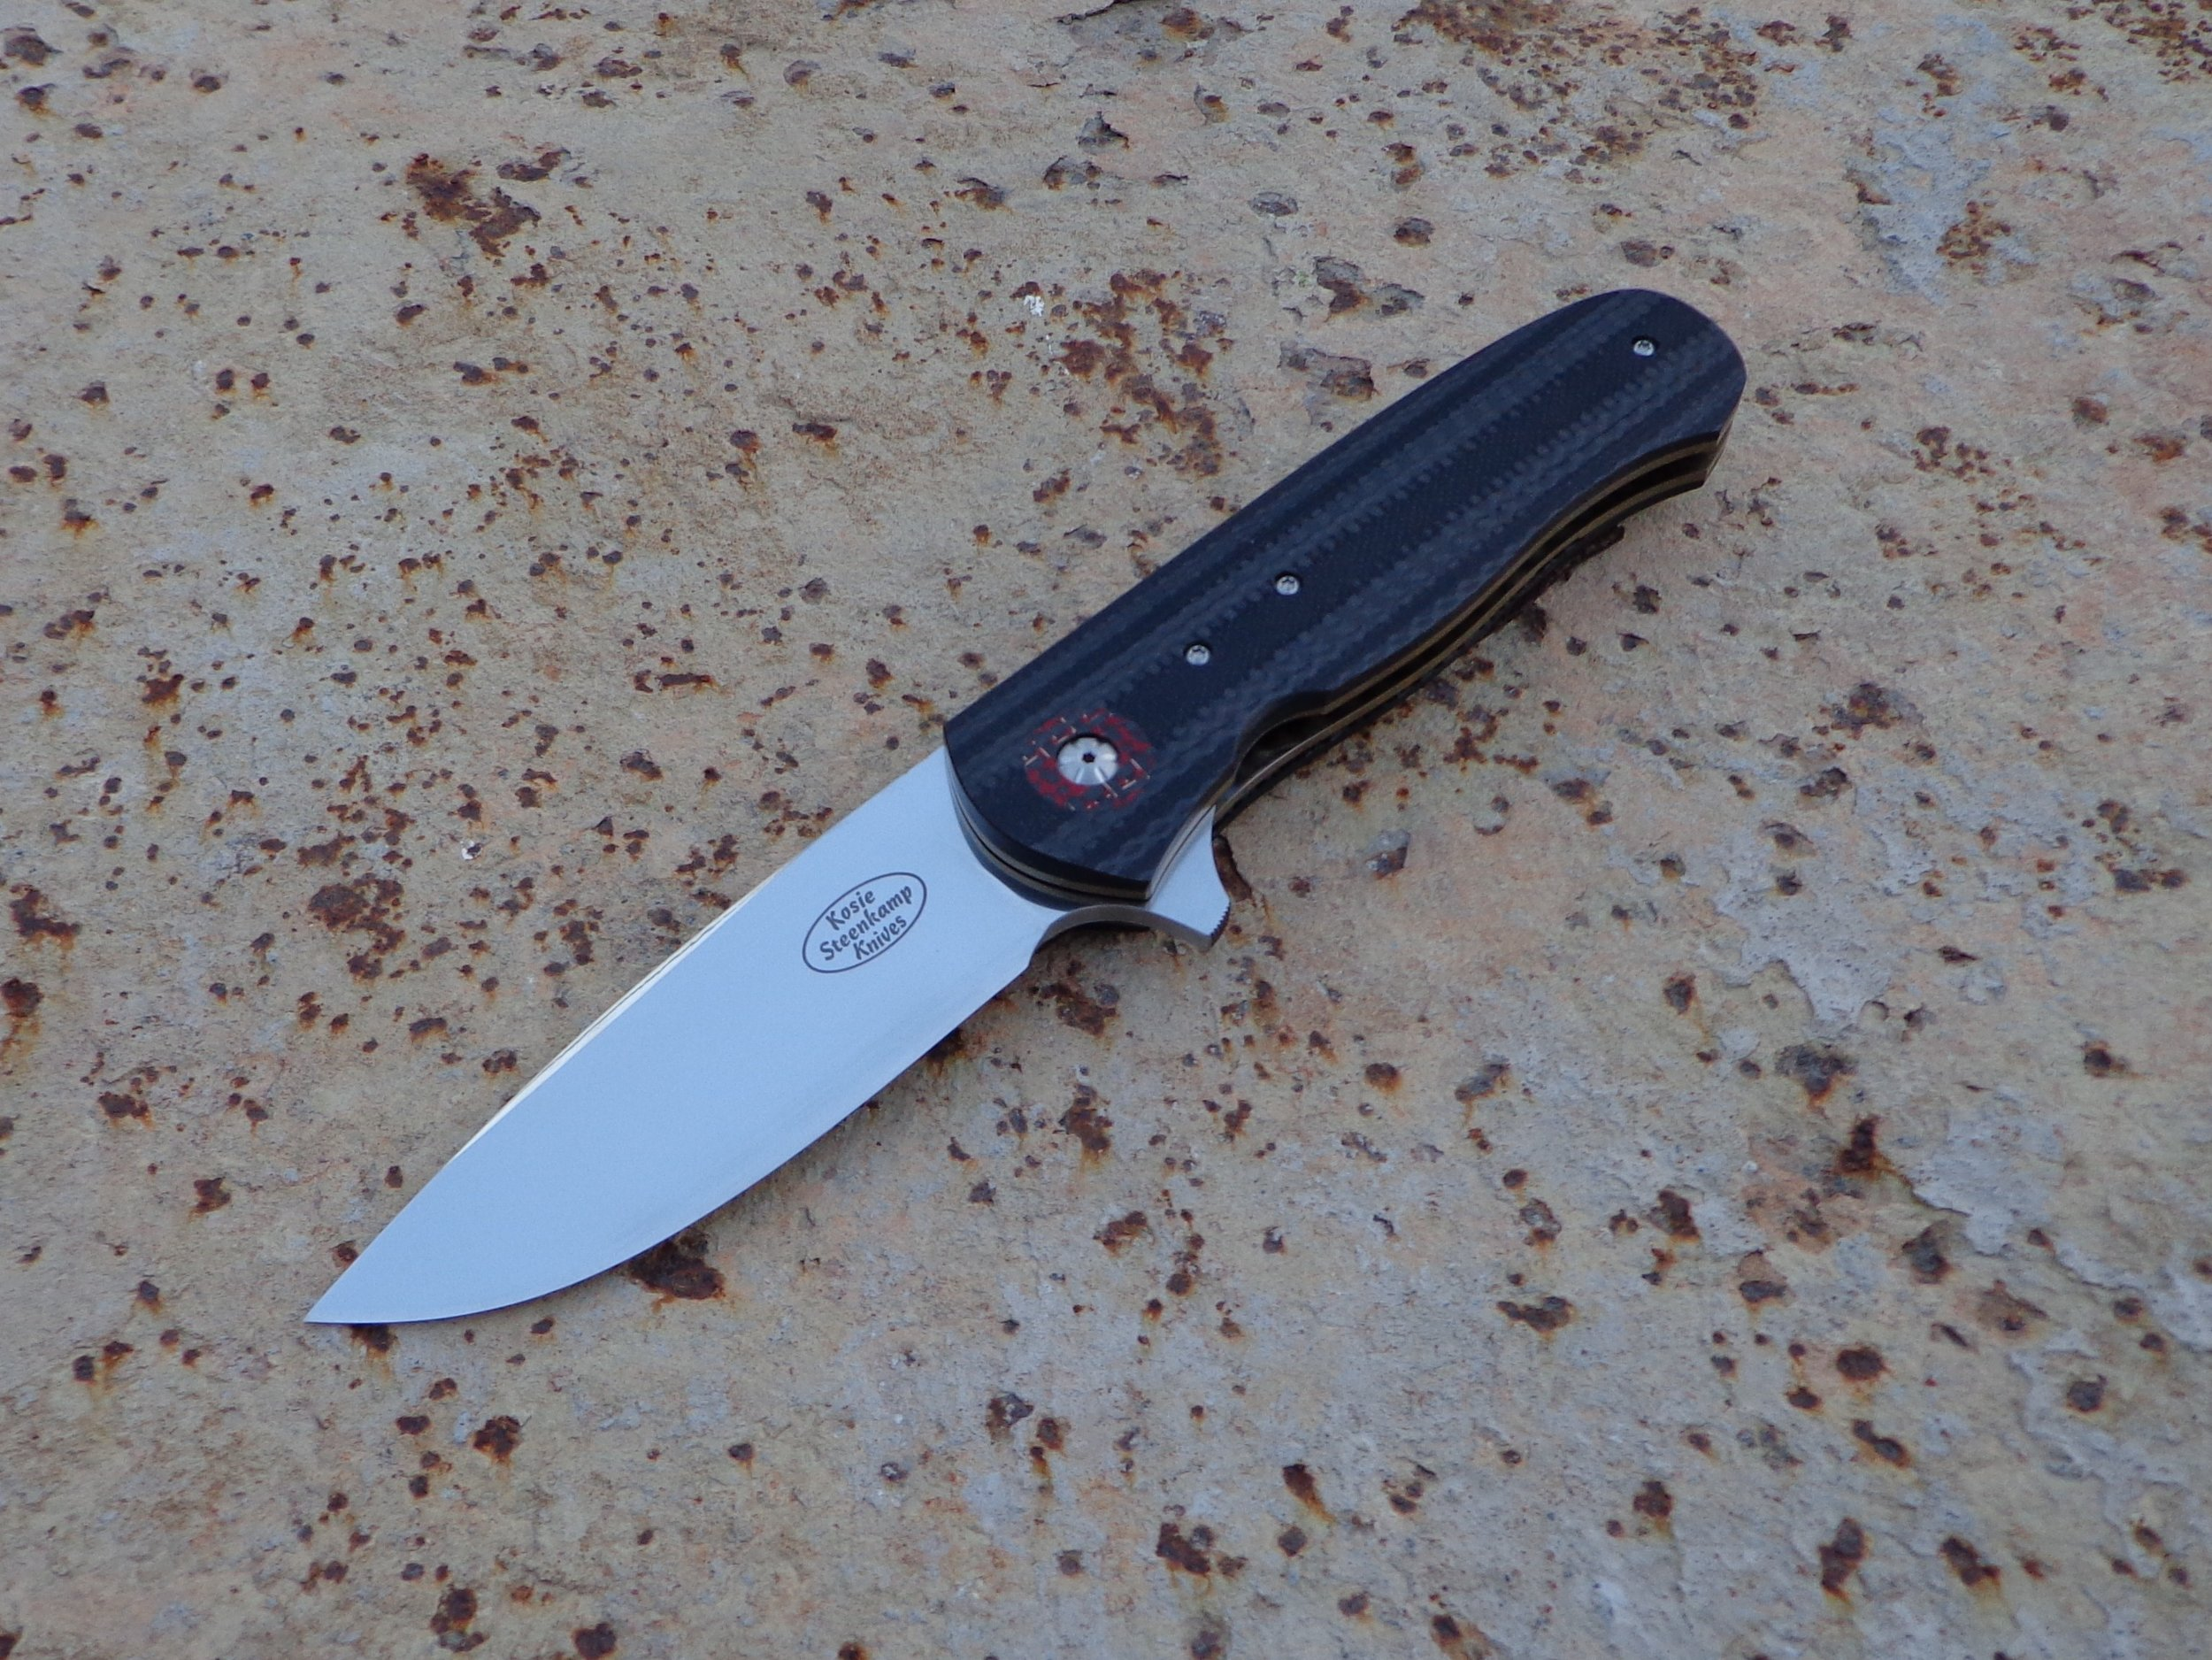 Knife: Vantage Flipper. Blade: Böhler N690 Stainless Steel. Handle scales: Carbon Fiber + G10. Liners and pocket clip: Titanium, anodized golden.